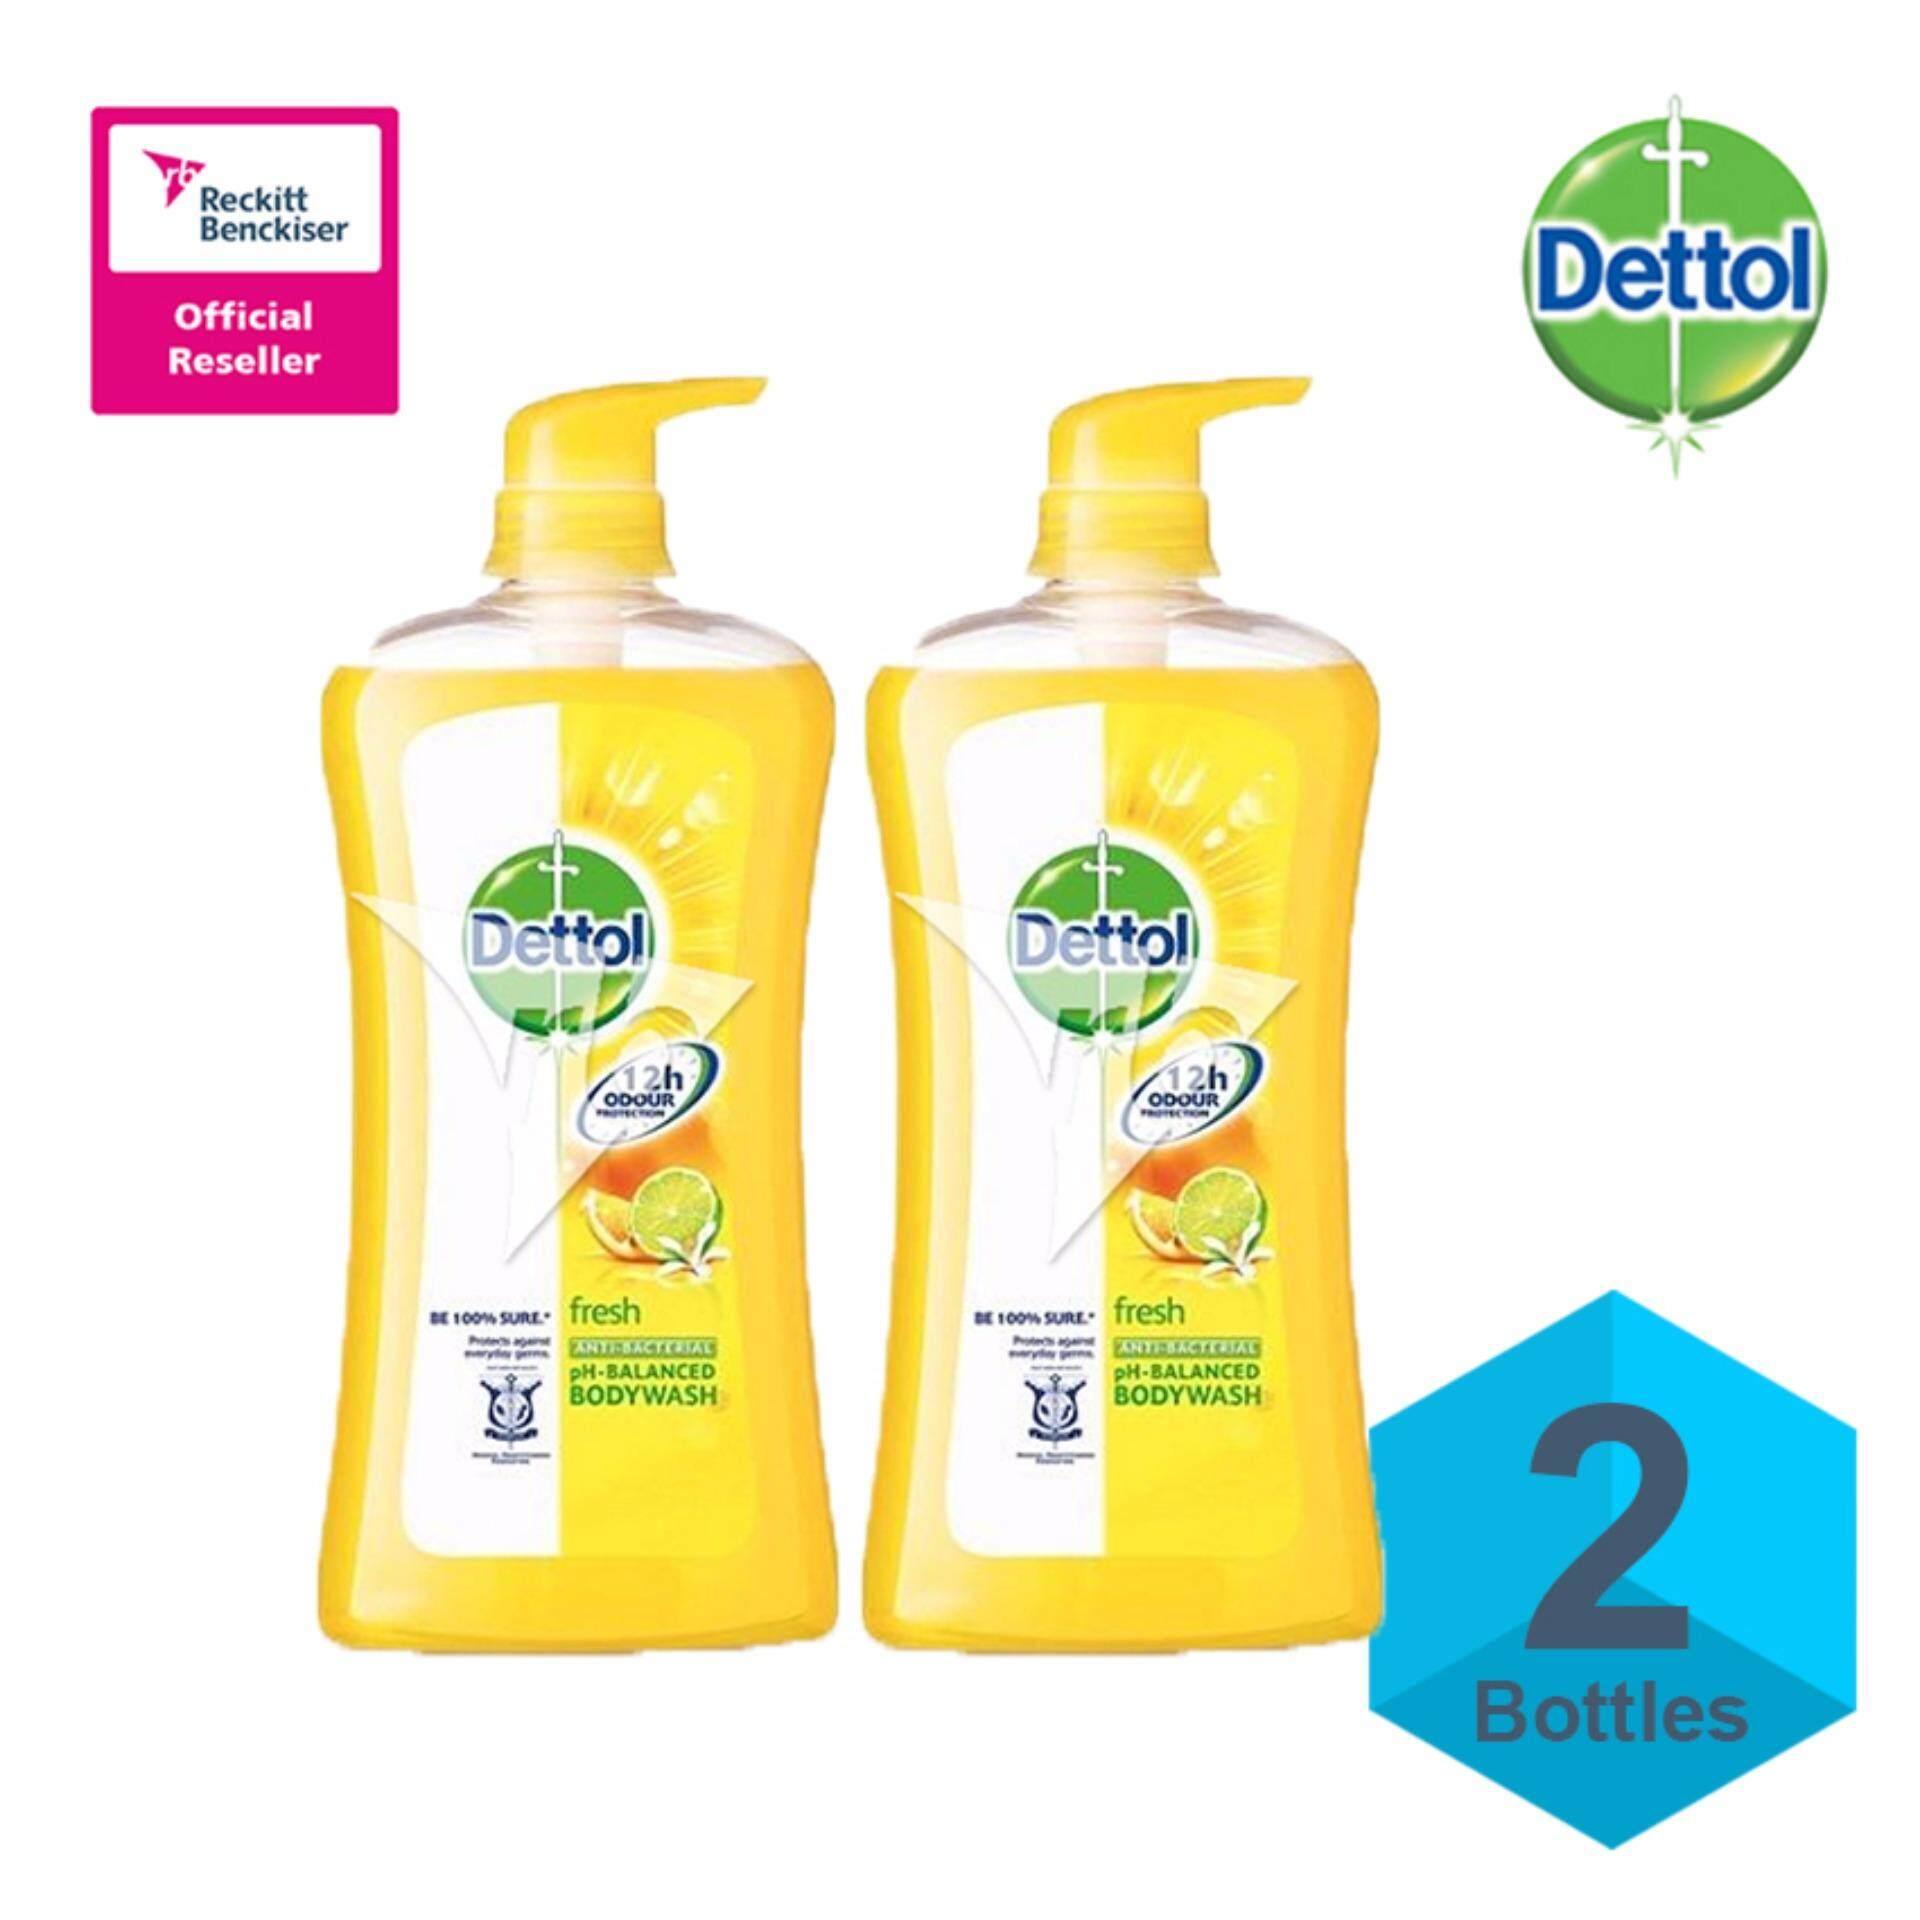 Kios Dettol Antiseptic Liquid 1l X 2 Vp Dan Info Price Terbaru 100 Ml Shower Gel 950ml Fresh 8091420tp